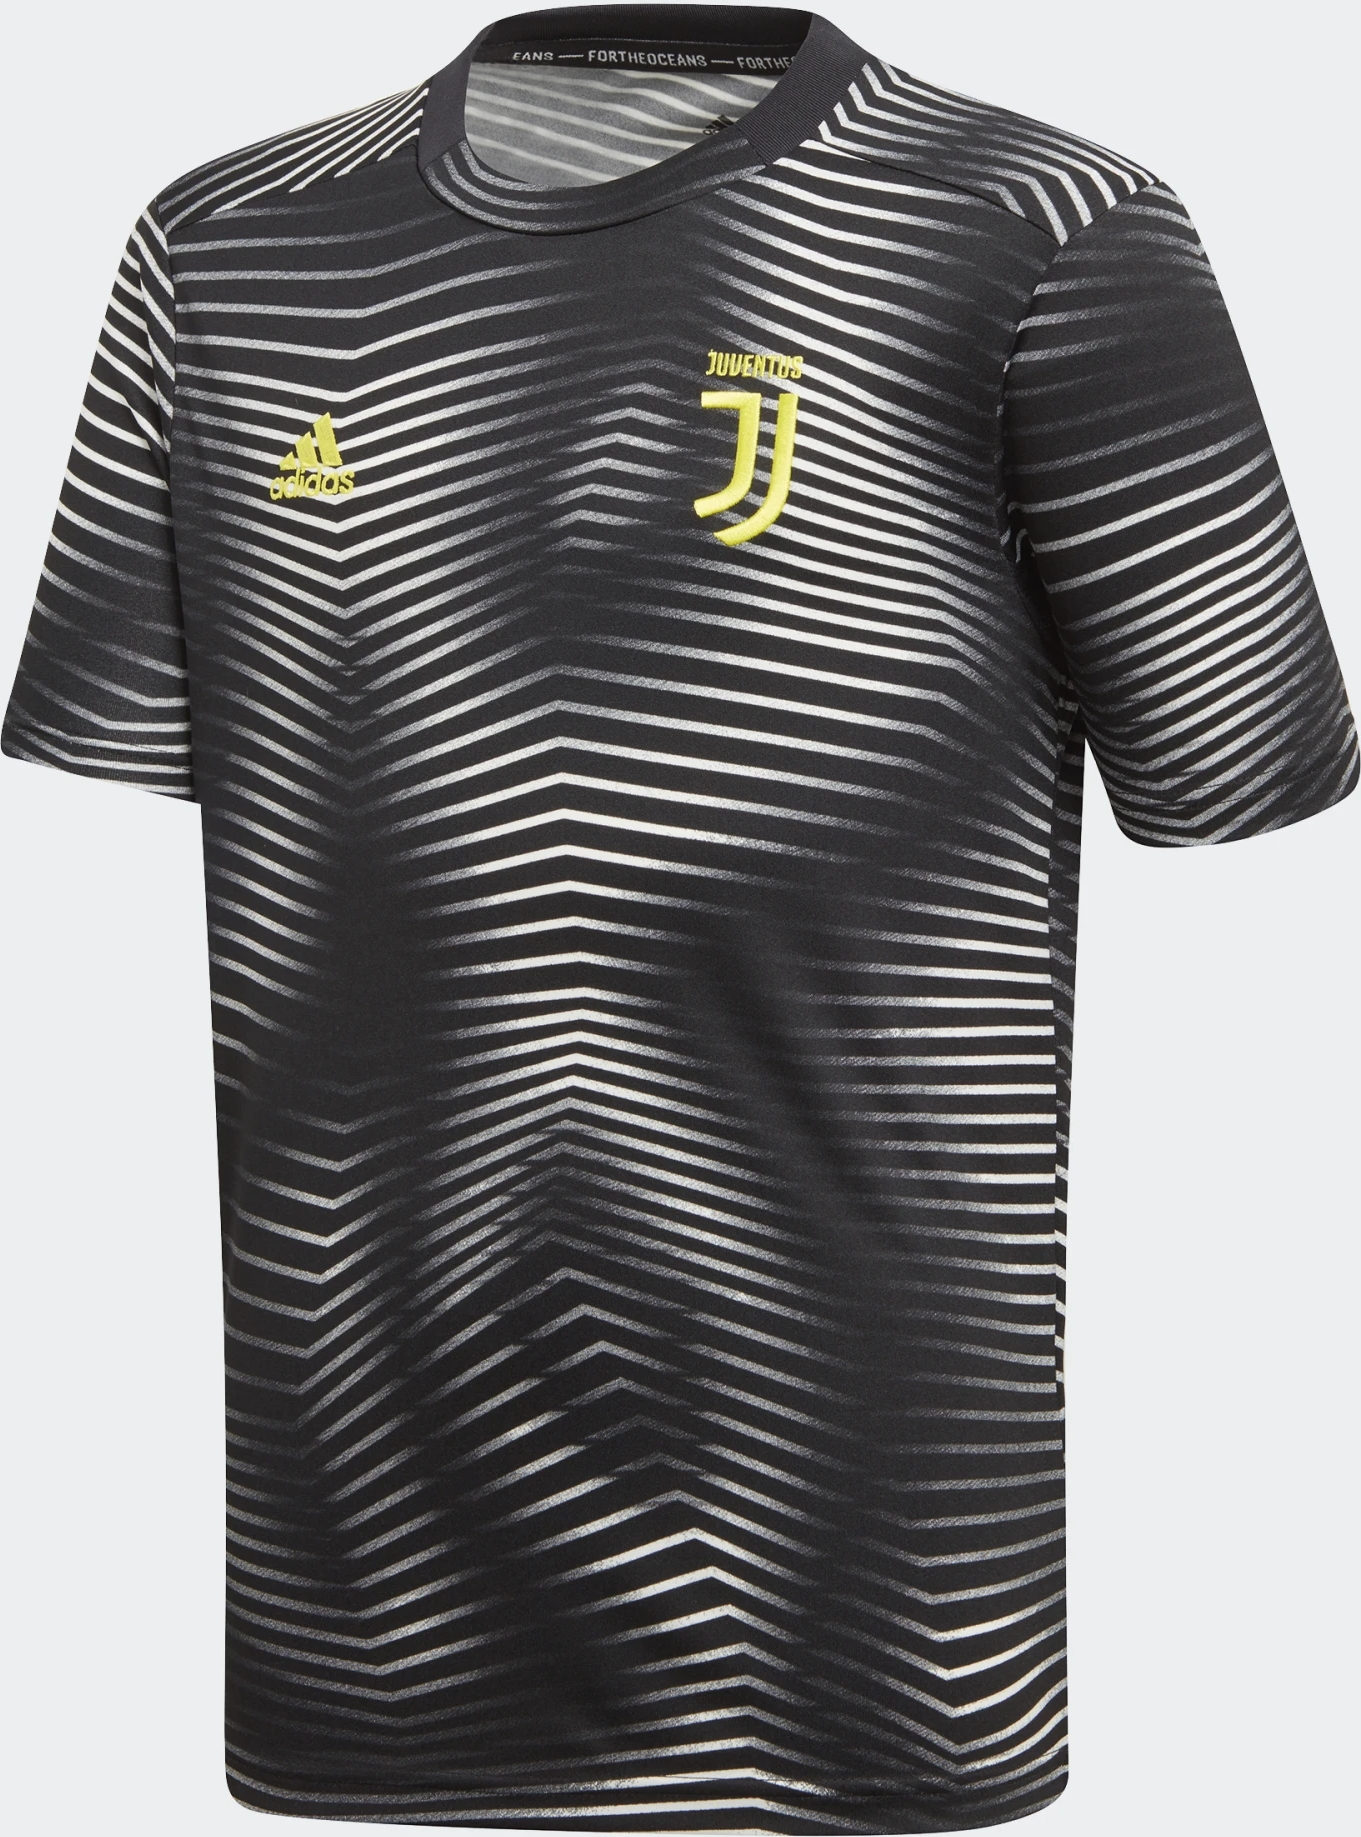 Футболка adidas Juve H Preshi Y